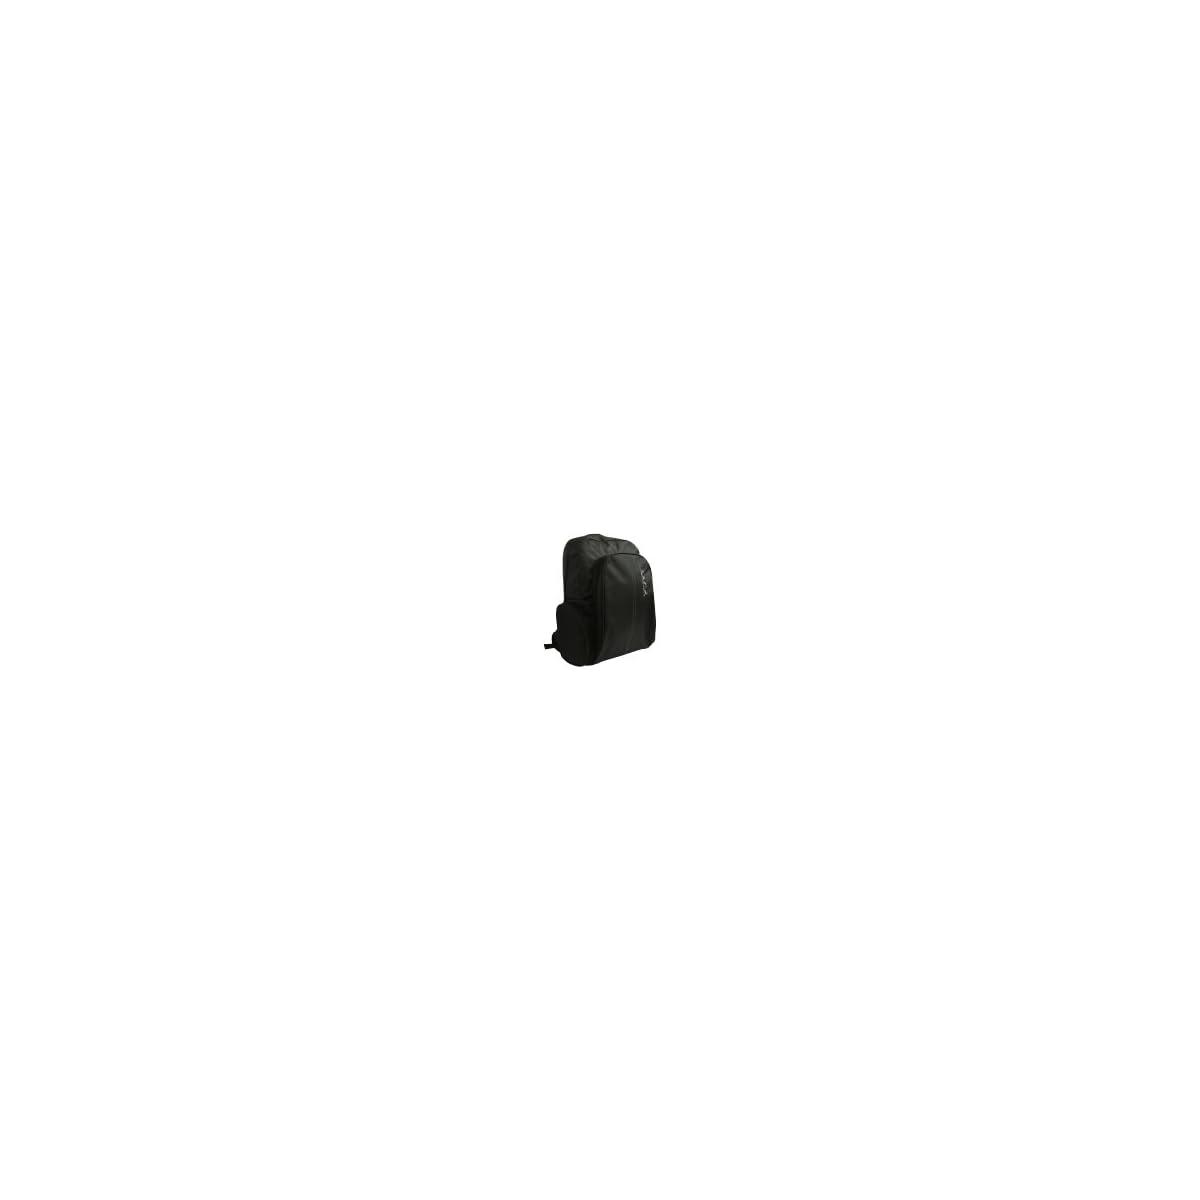 "11ZtTa%2B7VmL. SS1200  - Port Designs AVORIAZ Black 15.4"" Mochila Negro - Funda (Mochila para tablet, 39,1 cm (15.4""), 630 g, Negro)"